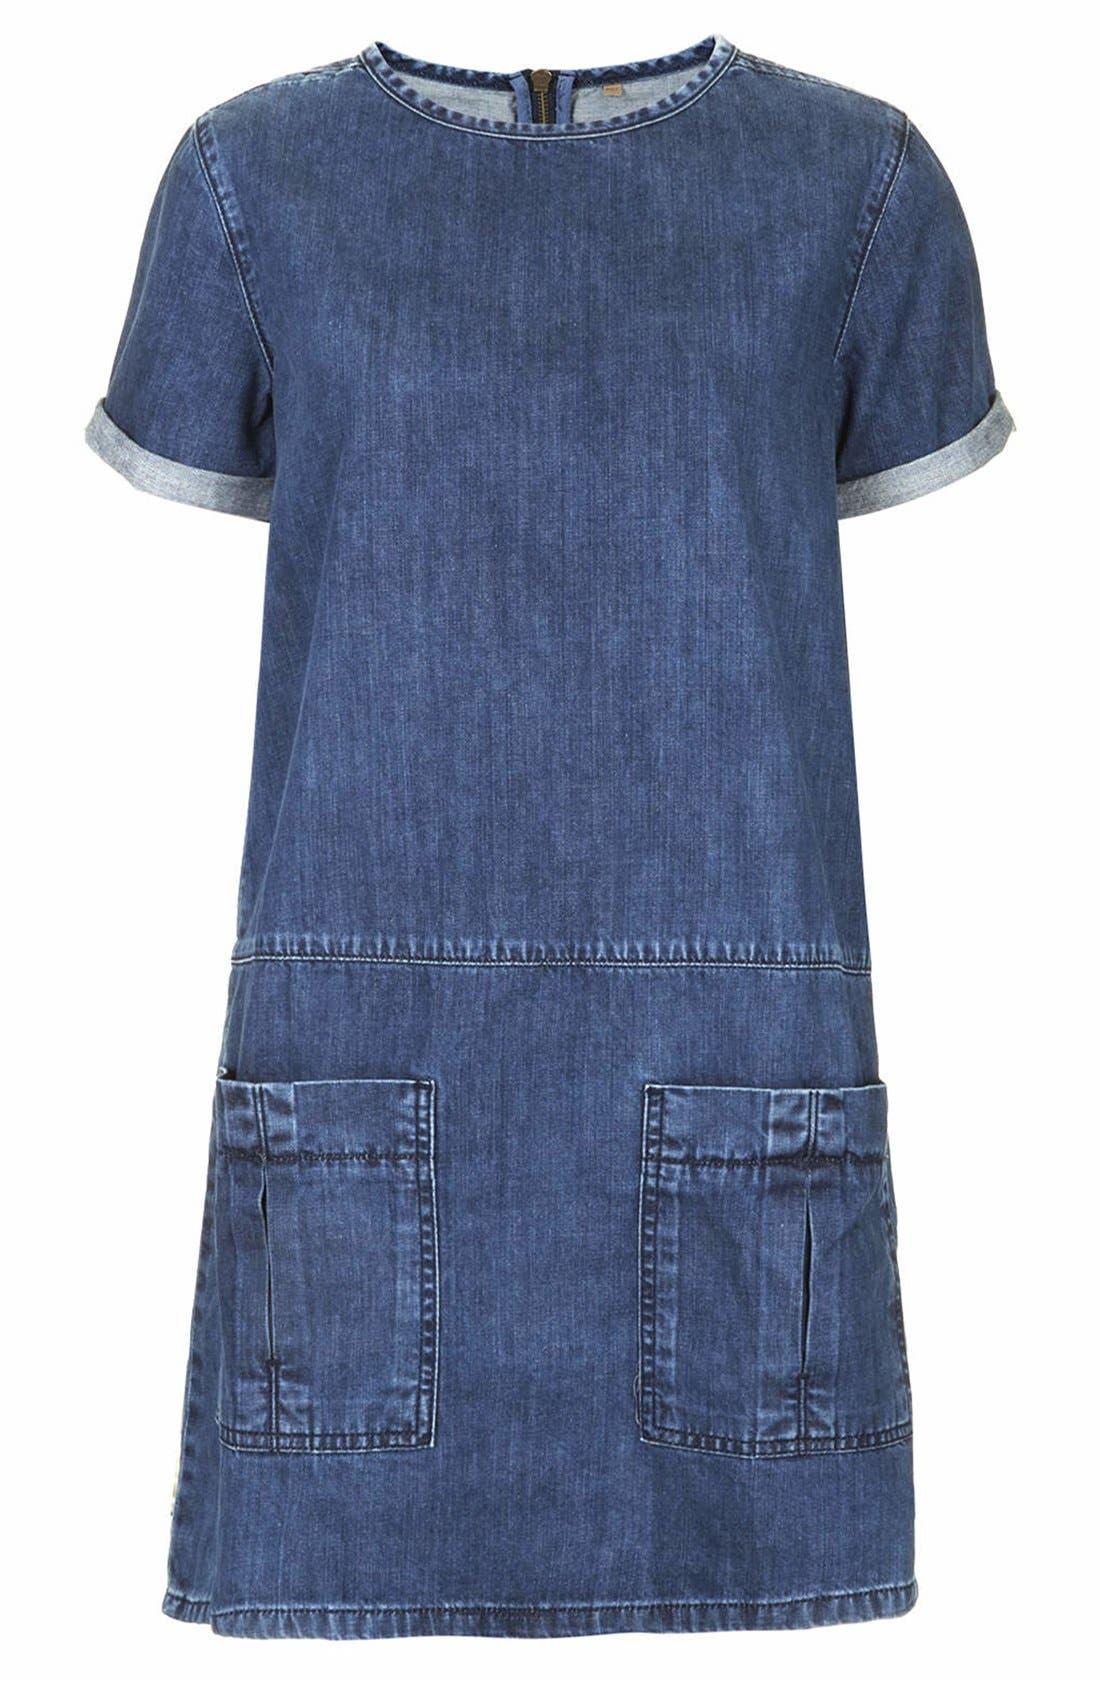 Alternate Image 3  - Topshop Moto Denim T-Shirt Dress